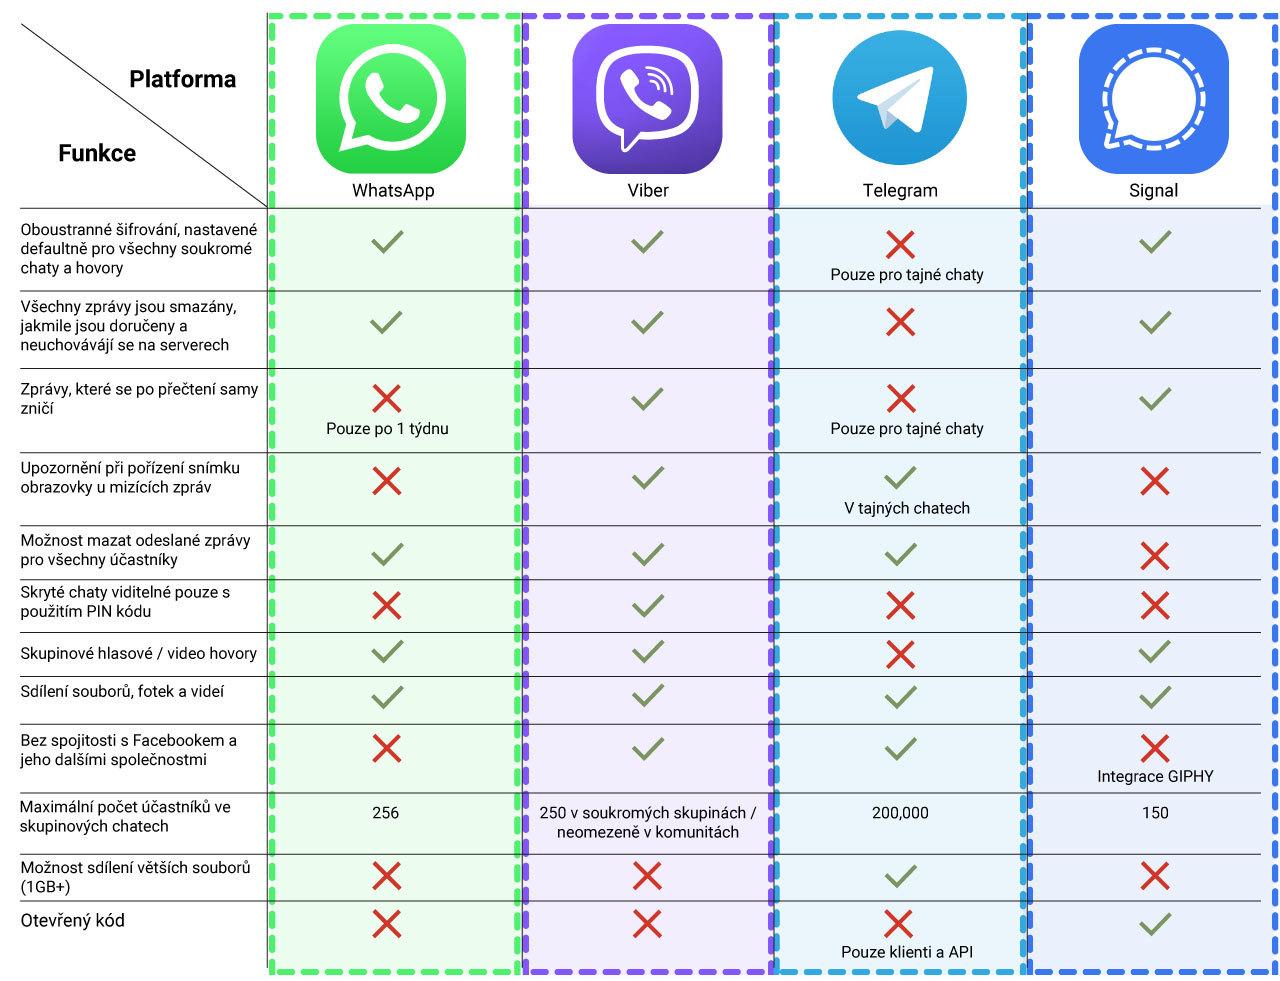 Srovnání Viber, WhatsApp, Telegram, Signal